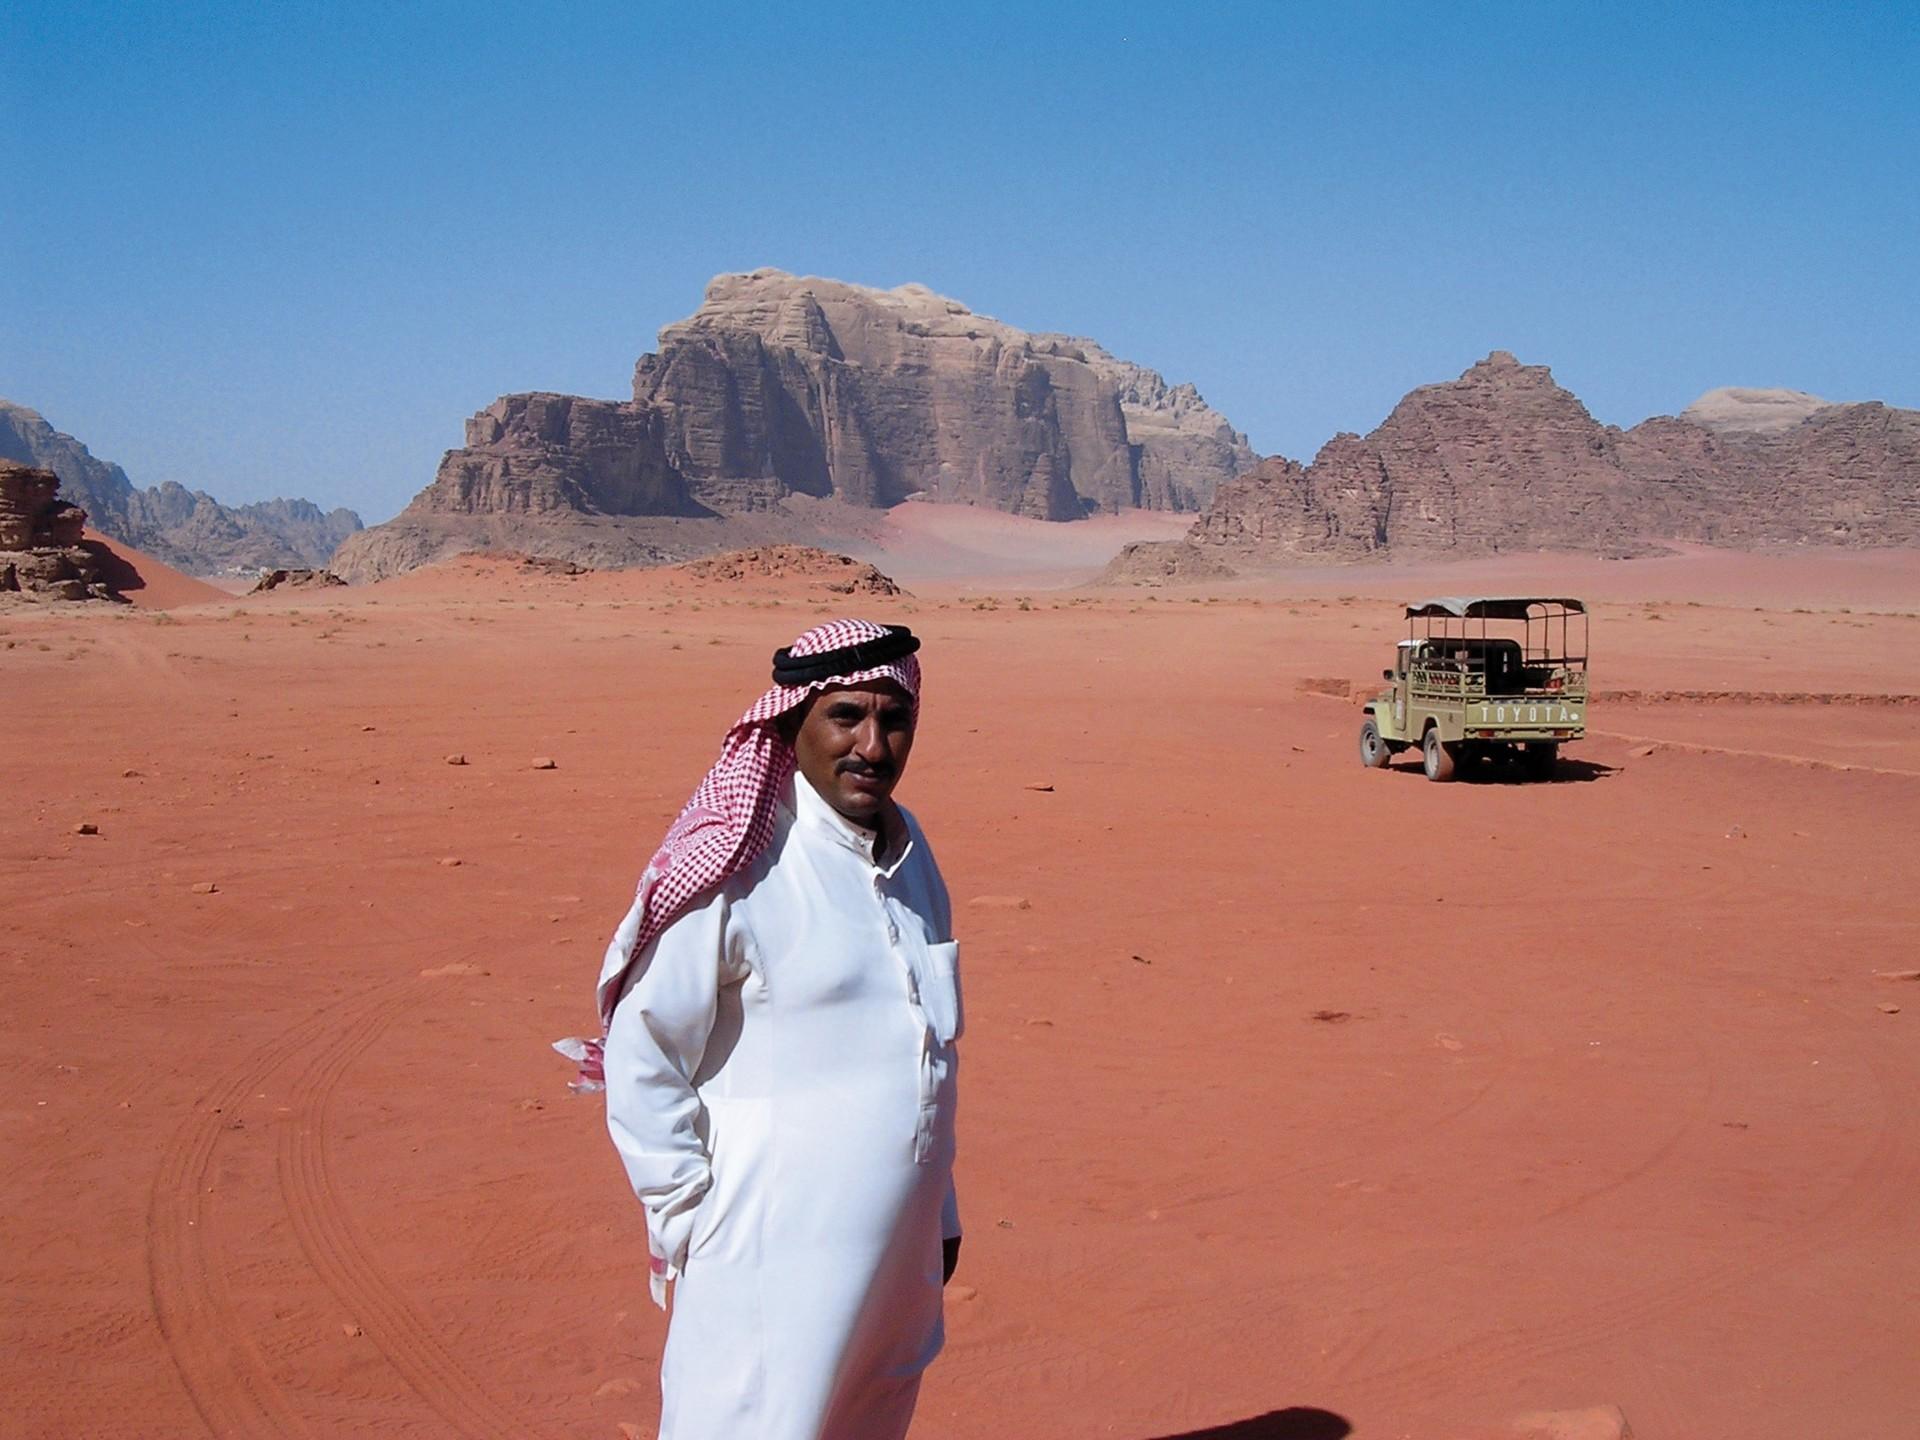 Jordanie Wadi Rum man met auto op achtergrond